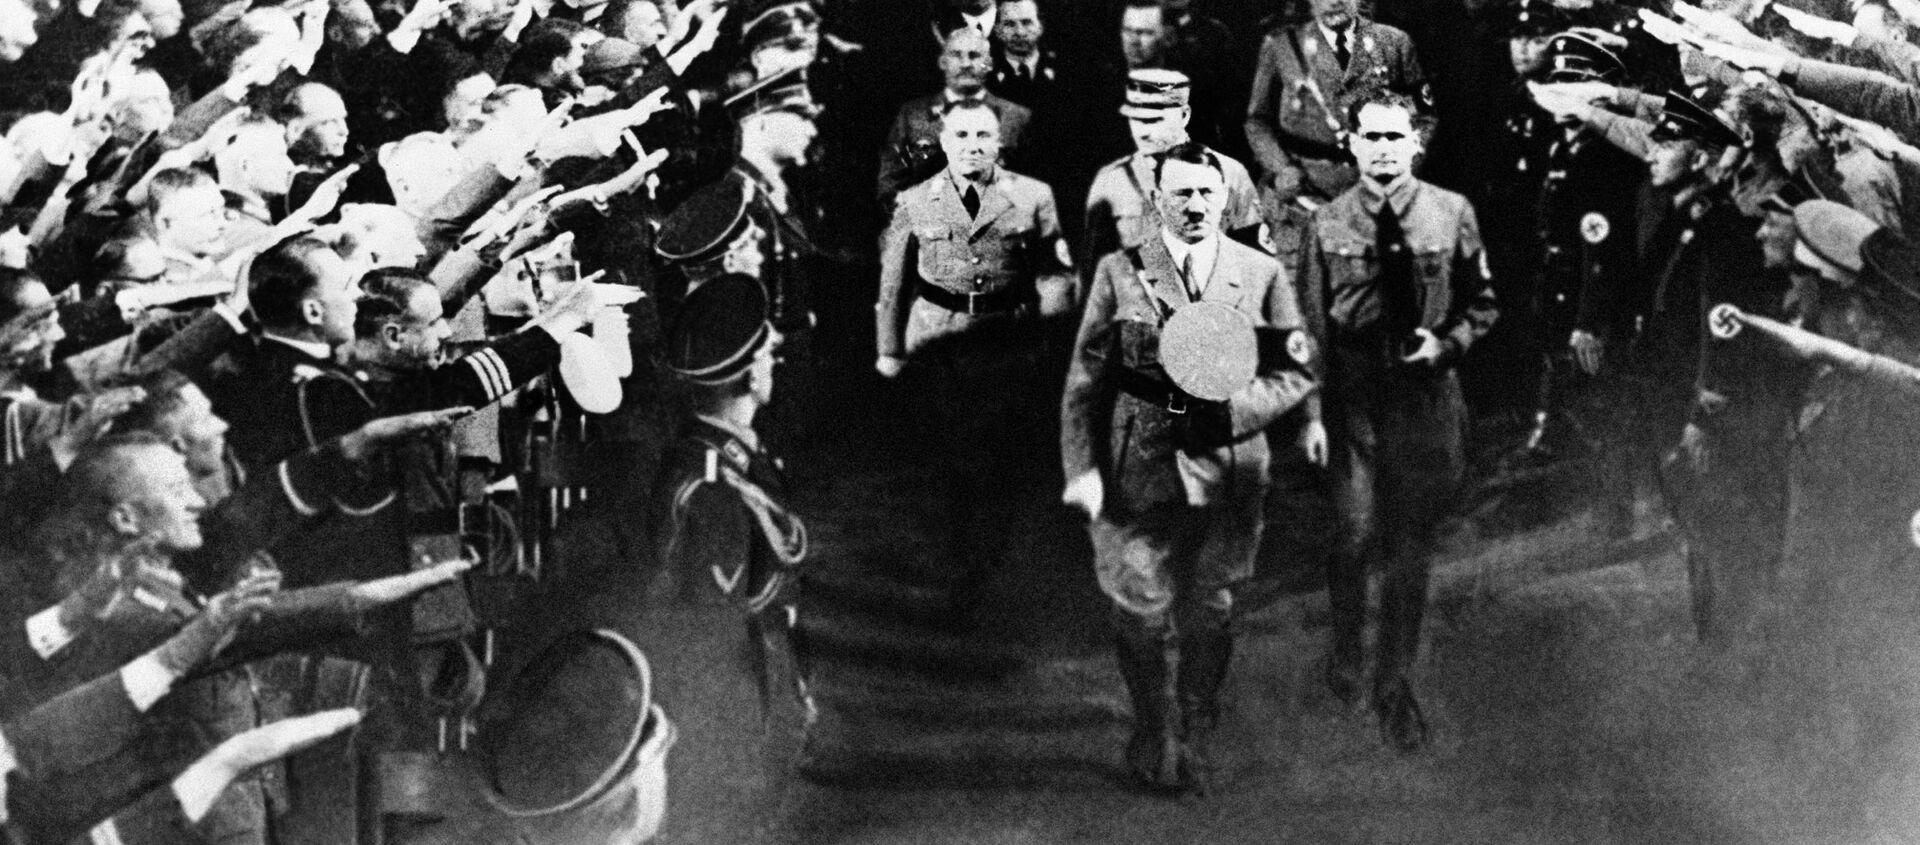 Адолф Хитлер - Sputnik Србија, 1920, 19.04.2020